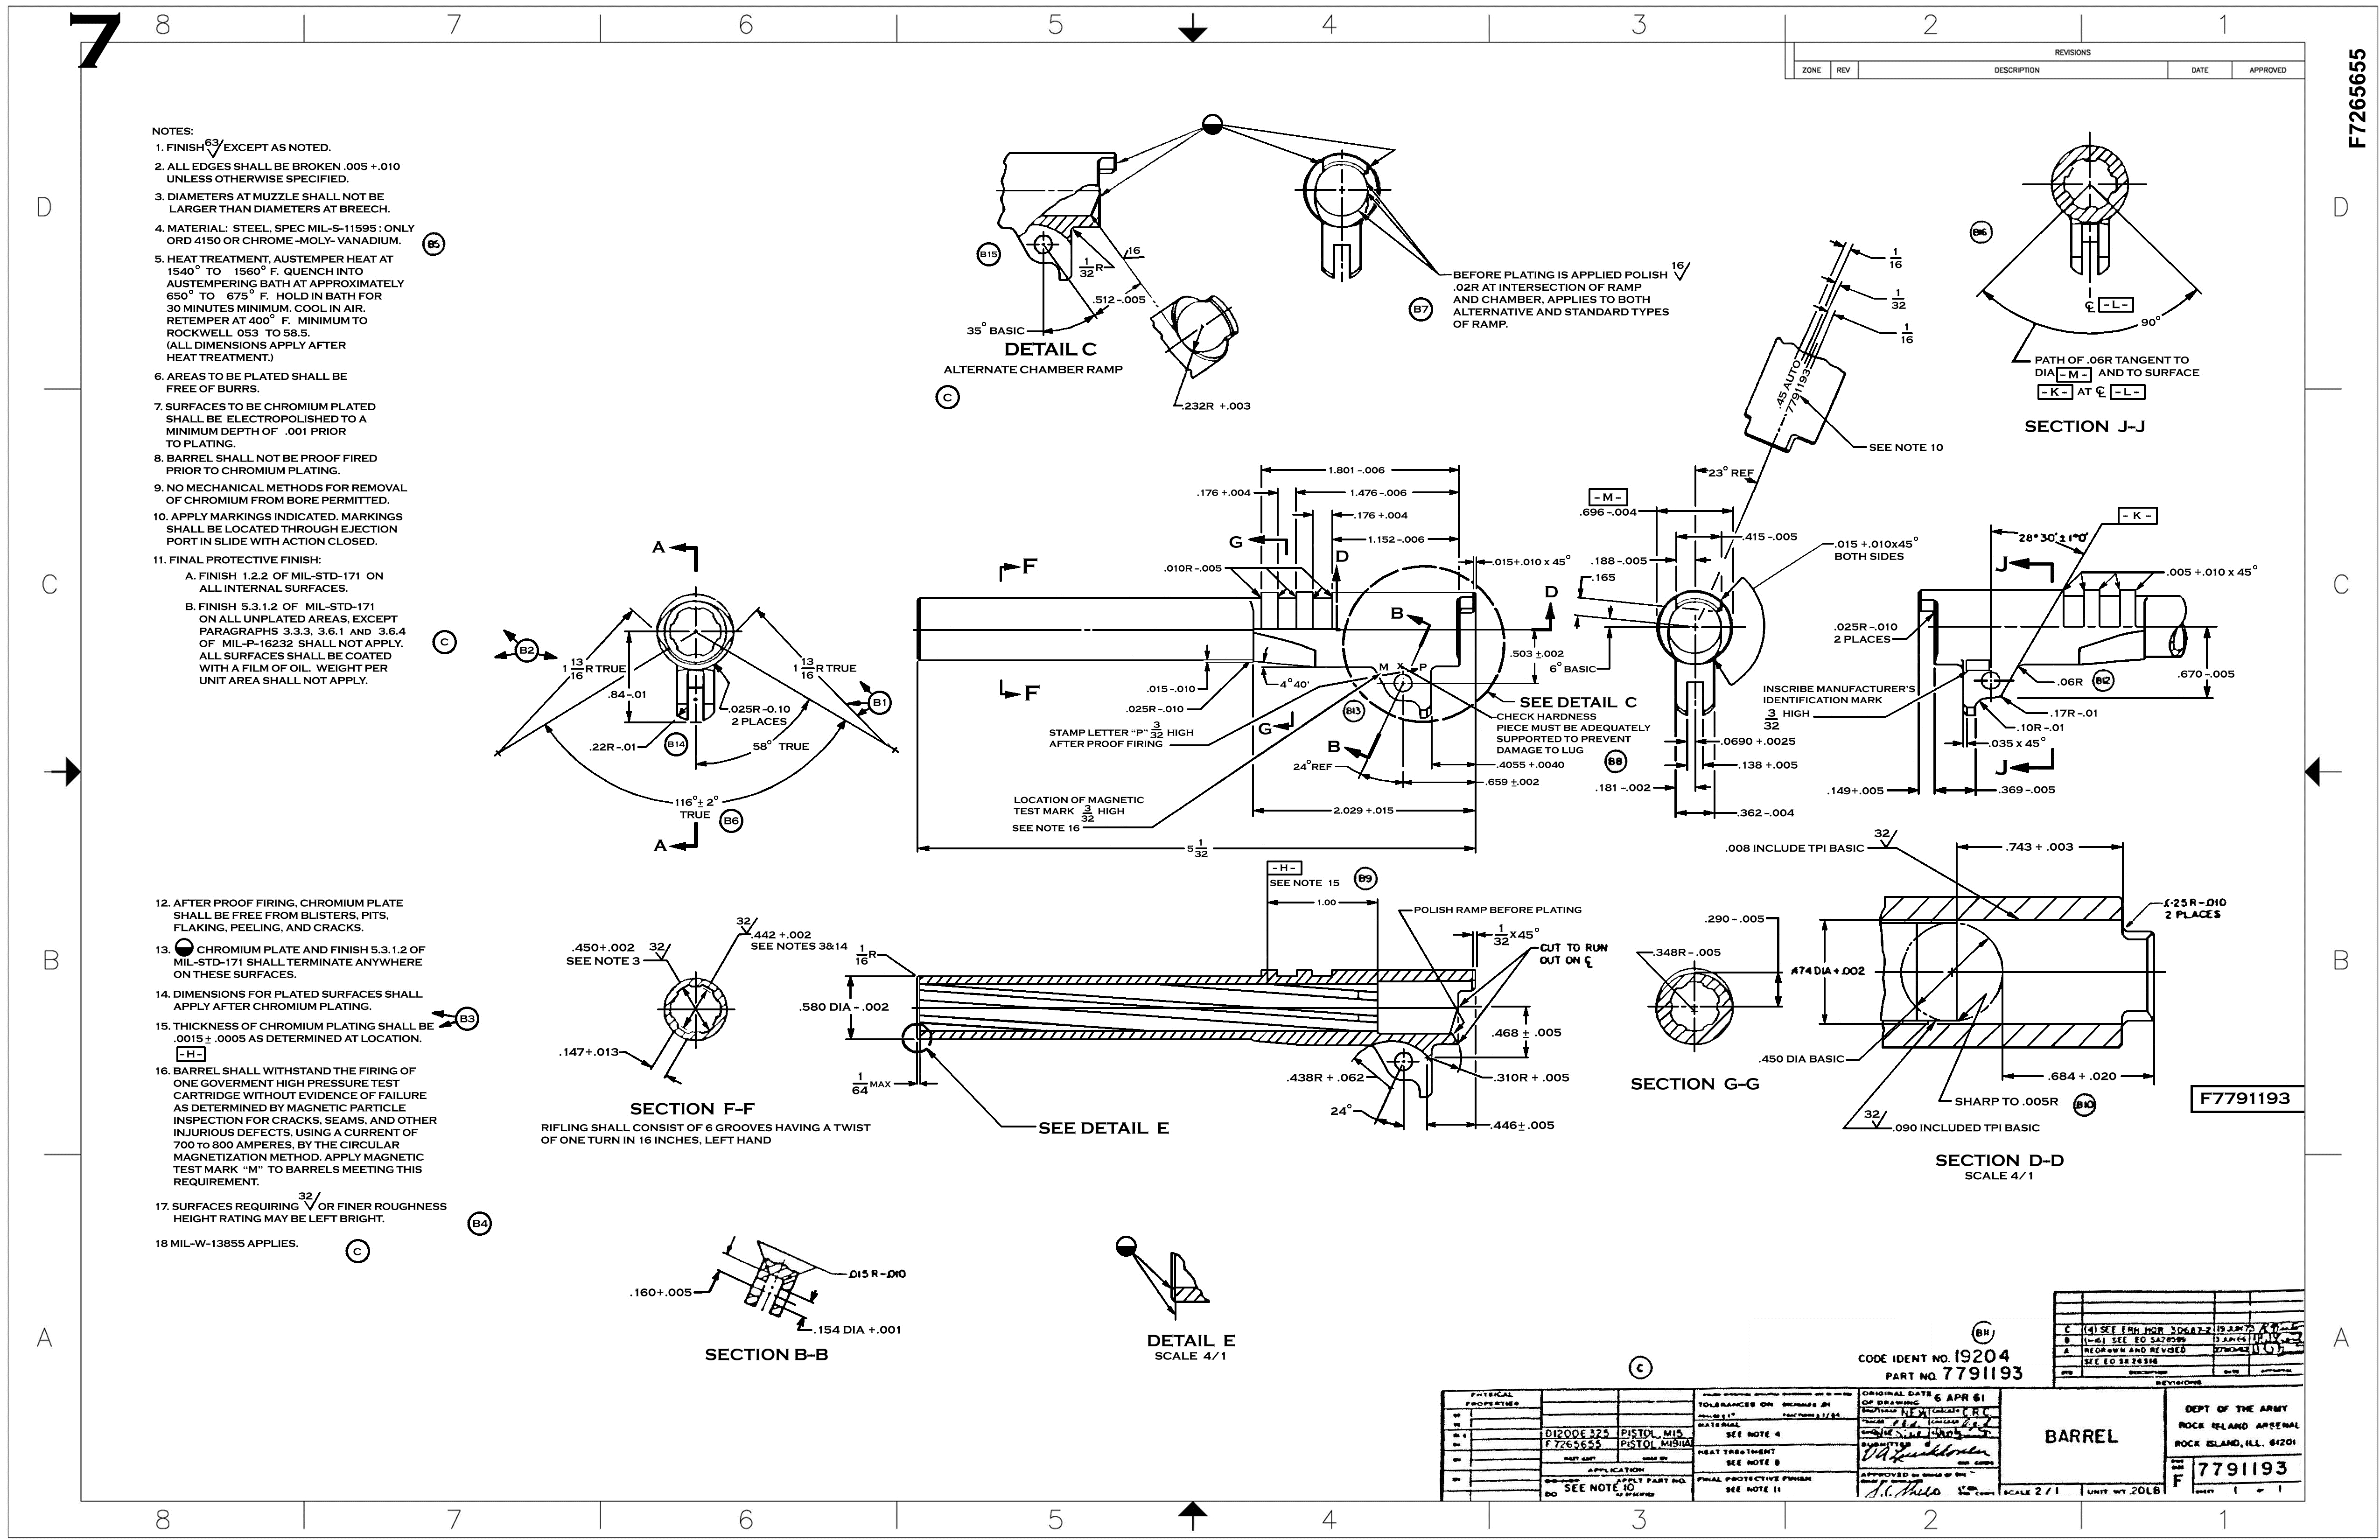 1911 technical drawings 1911 barrel malvernweather Choice Image